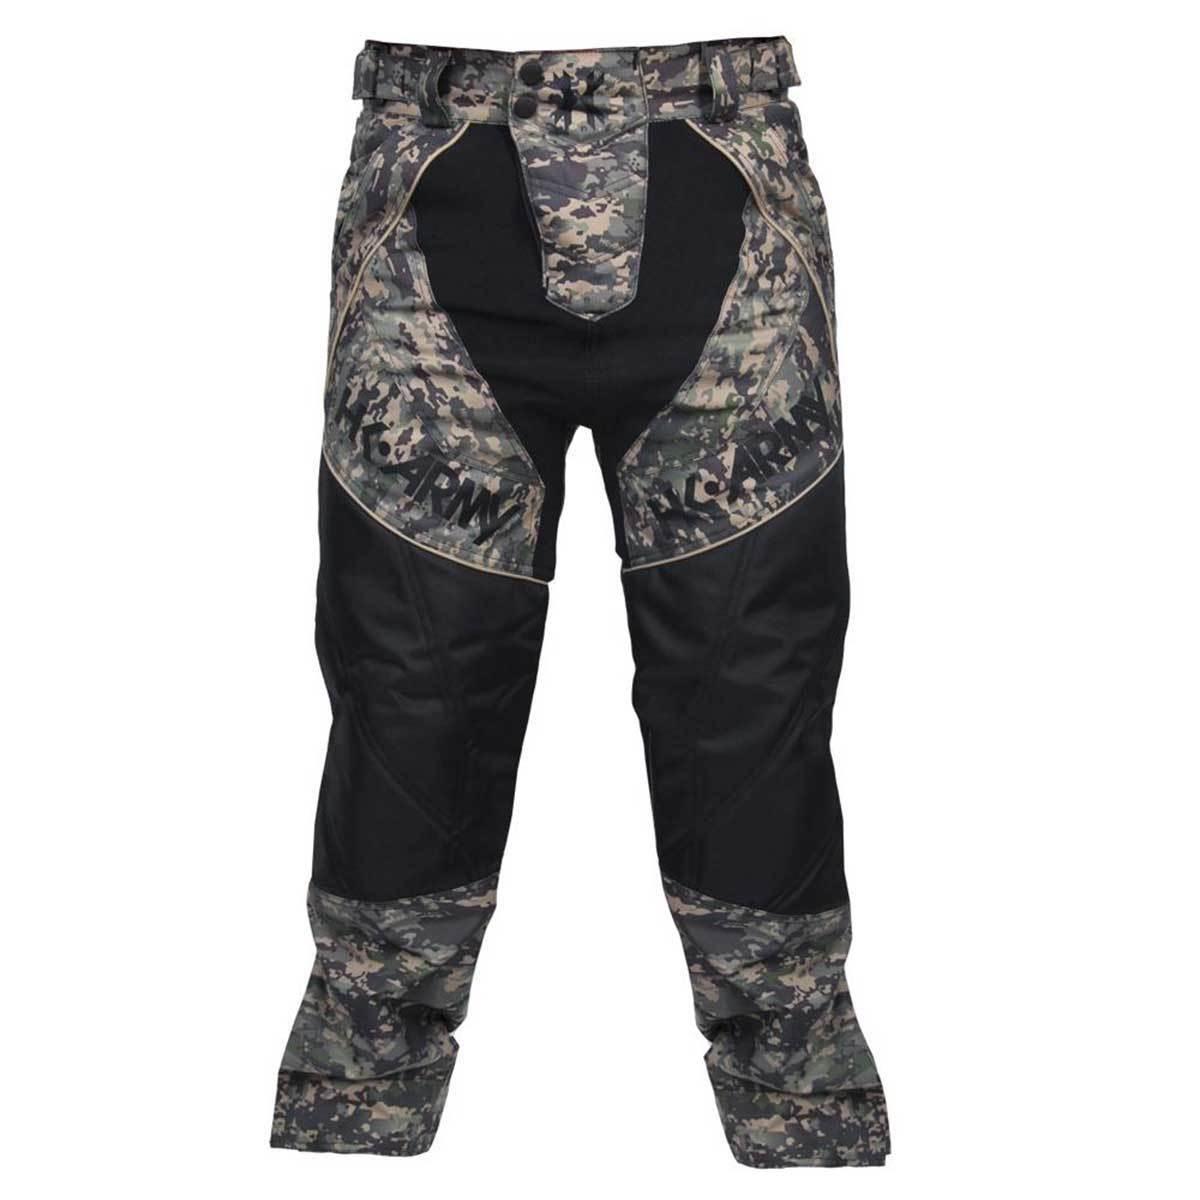 HK Army HSTL Line Pants - Camo - Large